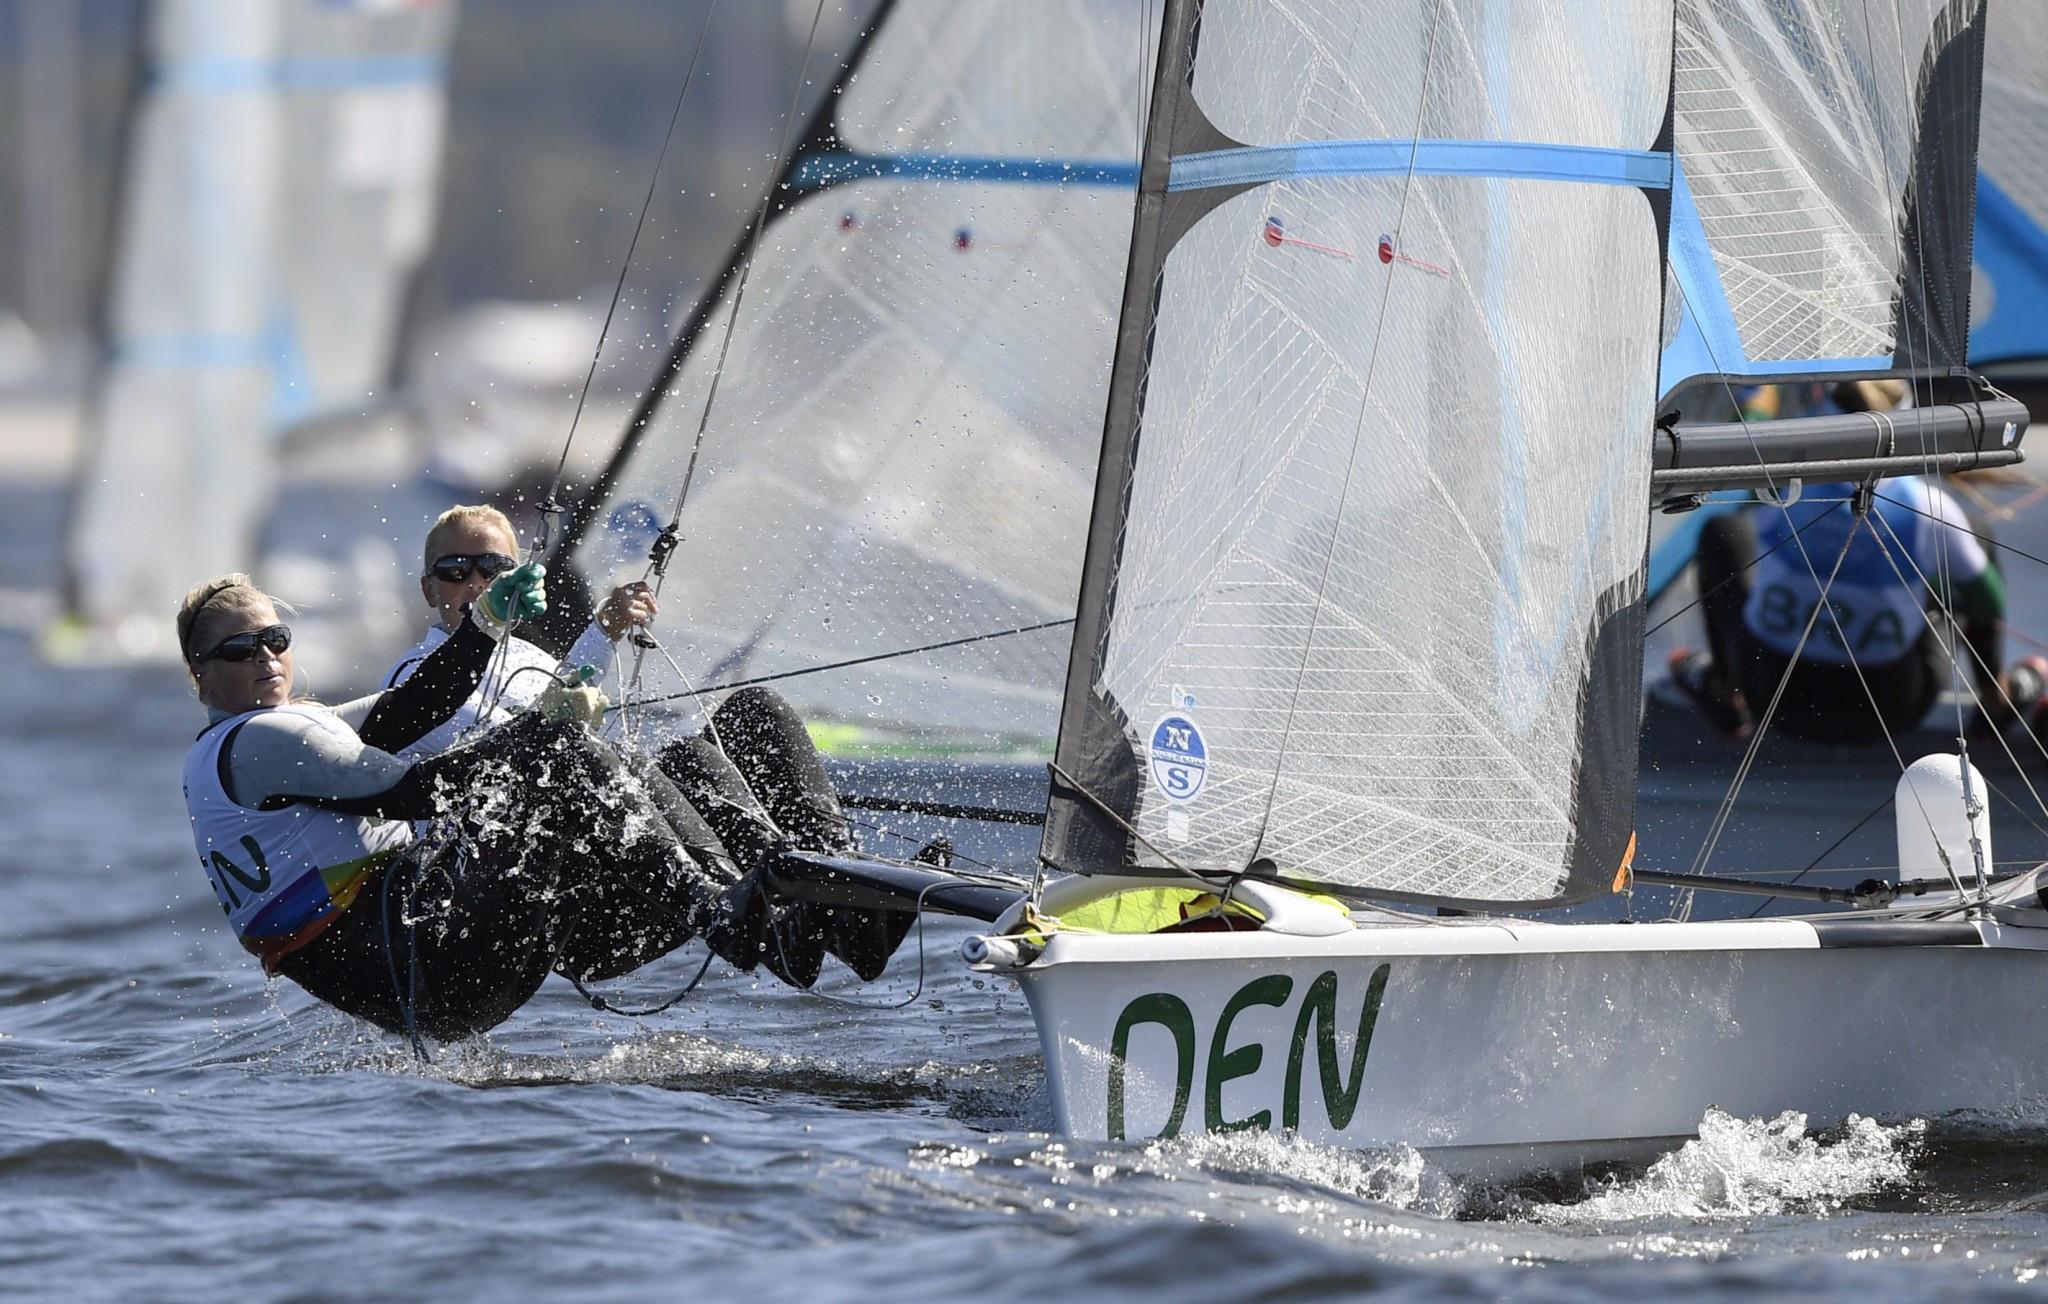 Denmark's Jena Hansen and Katja Salskov-Iversen secured gold in the 49erFX class ©Getty Images